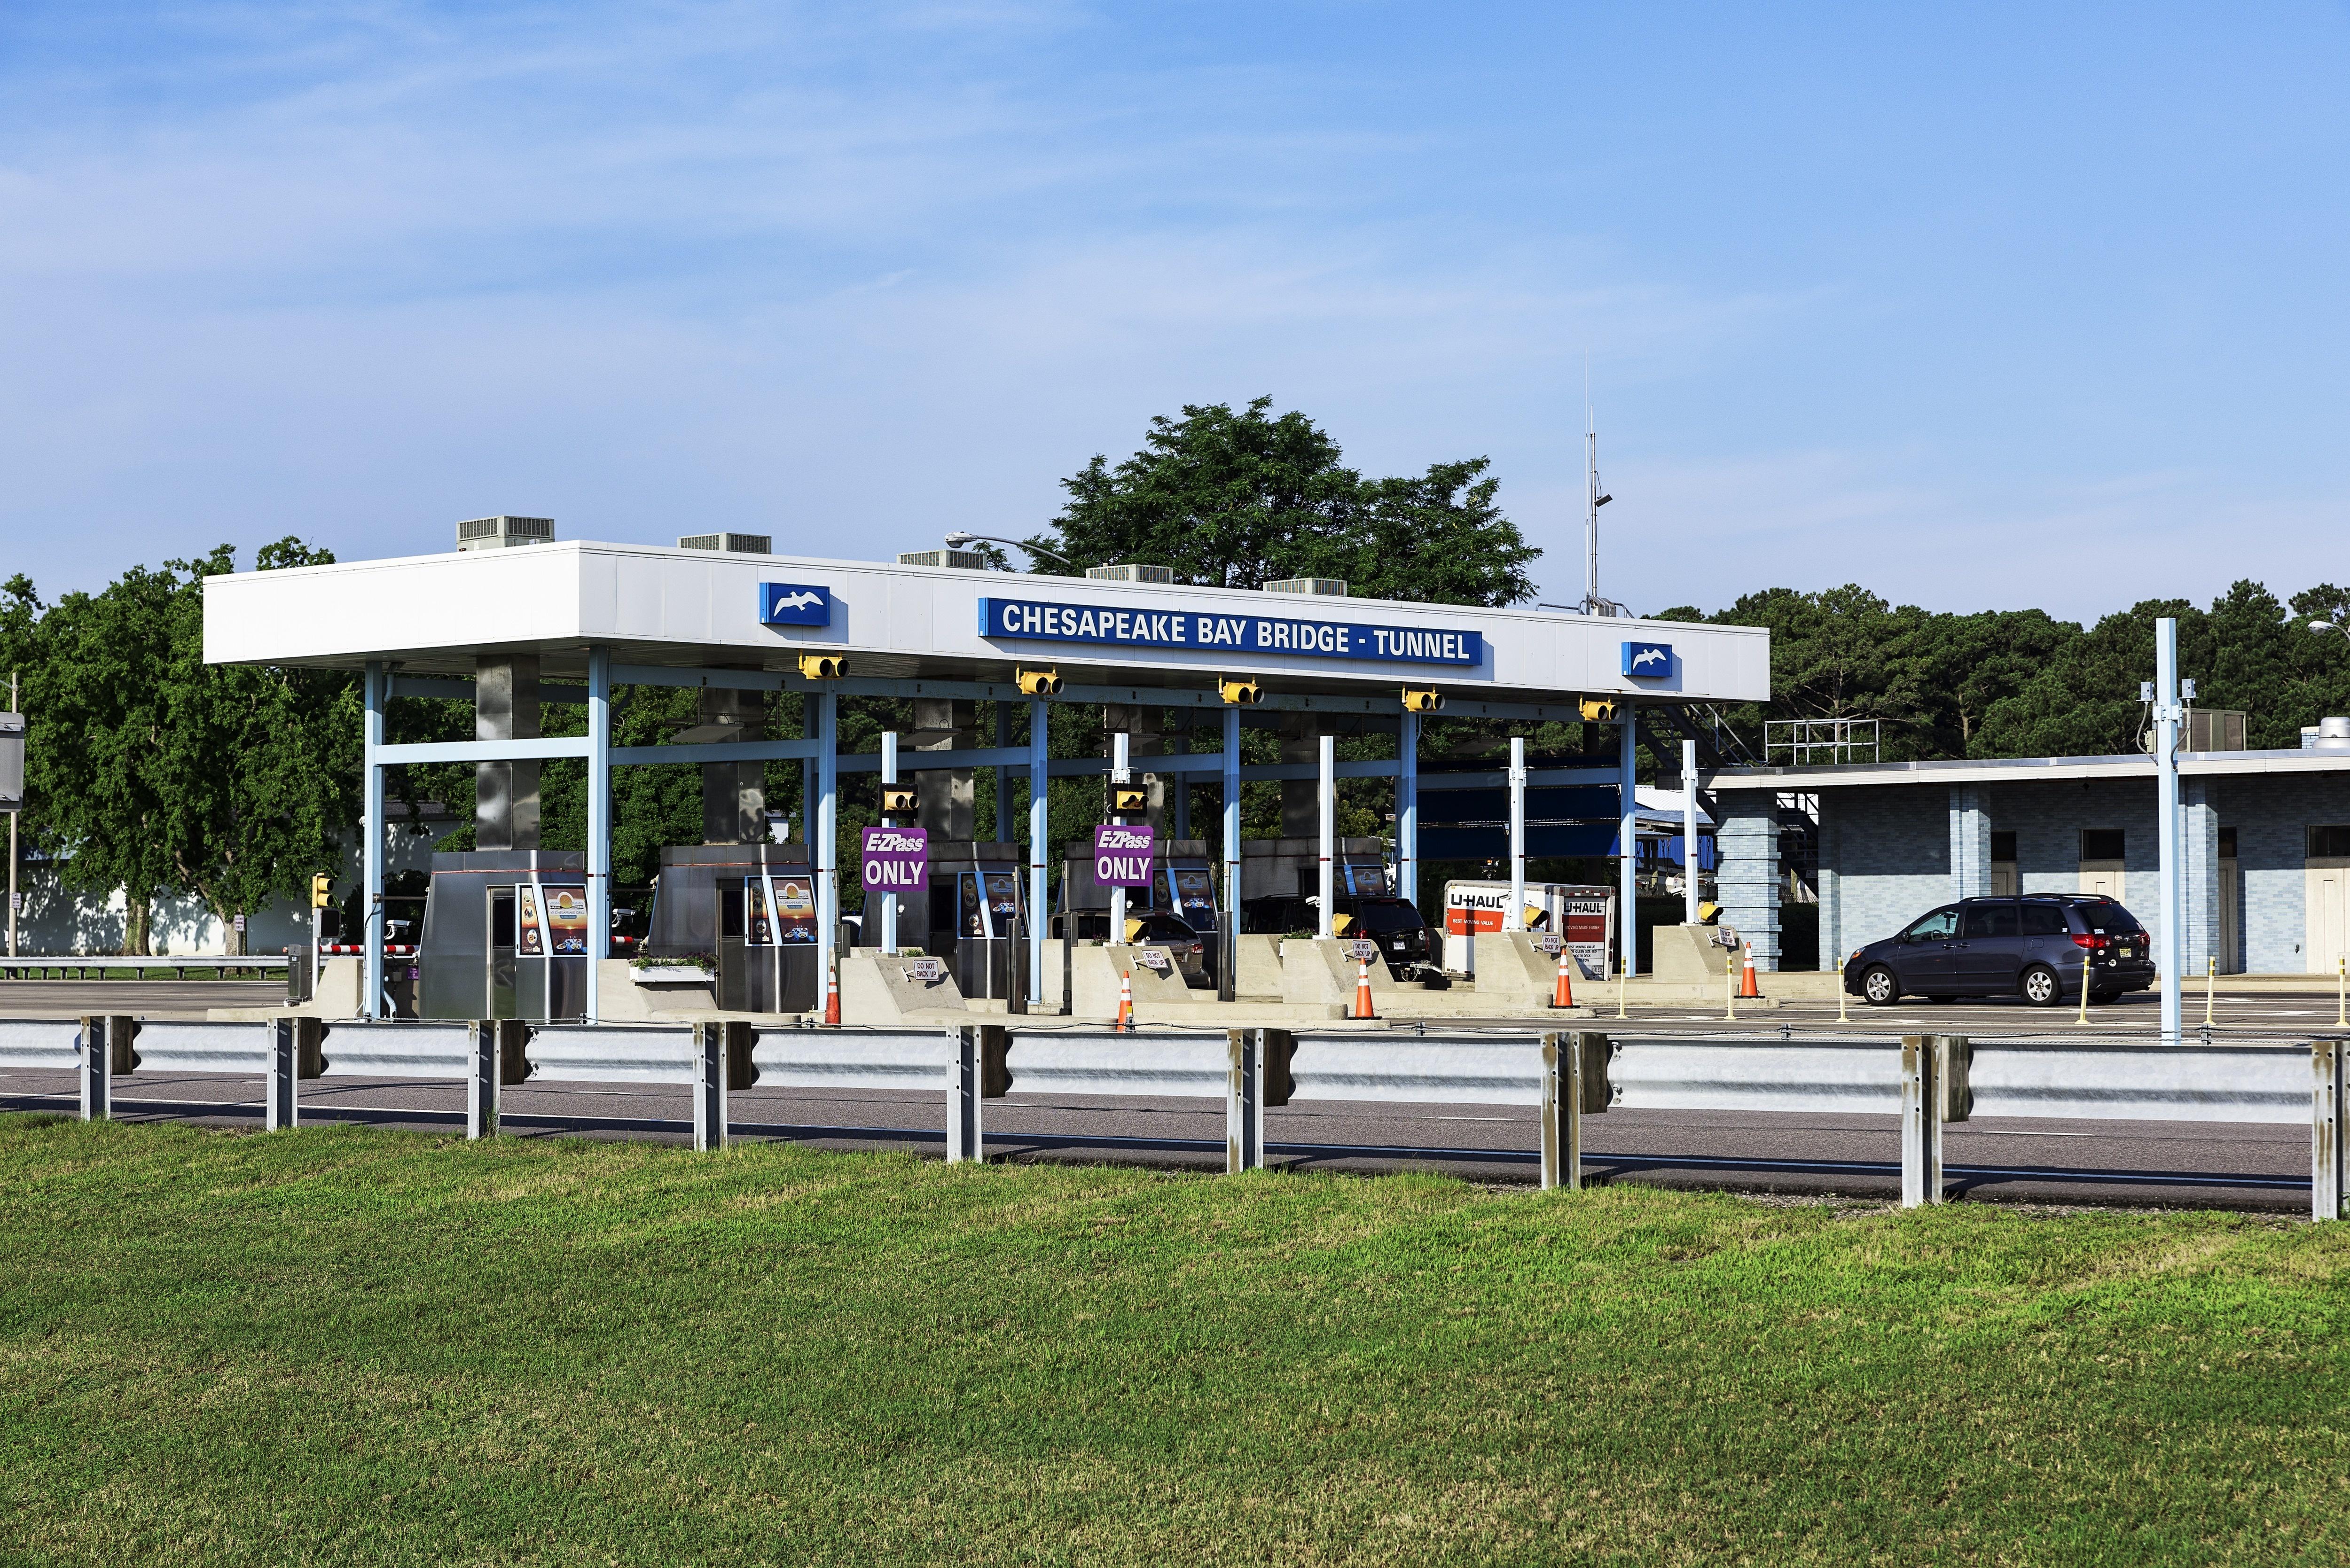 Chesapeake Bay Bridge Tunnel toll booth